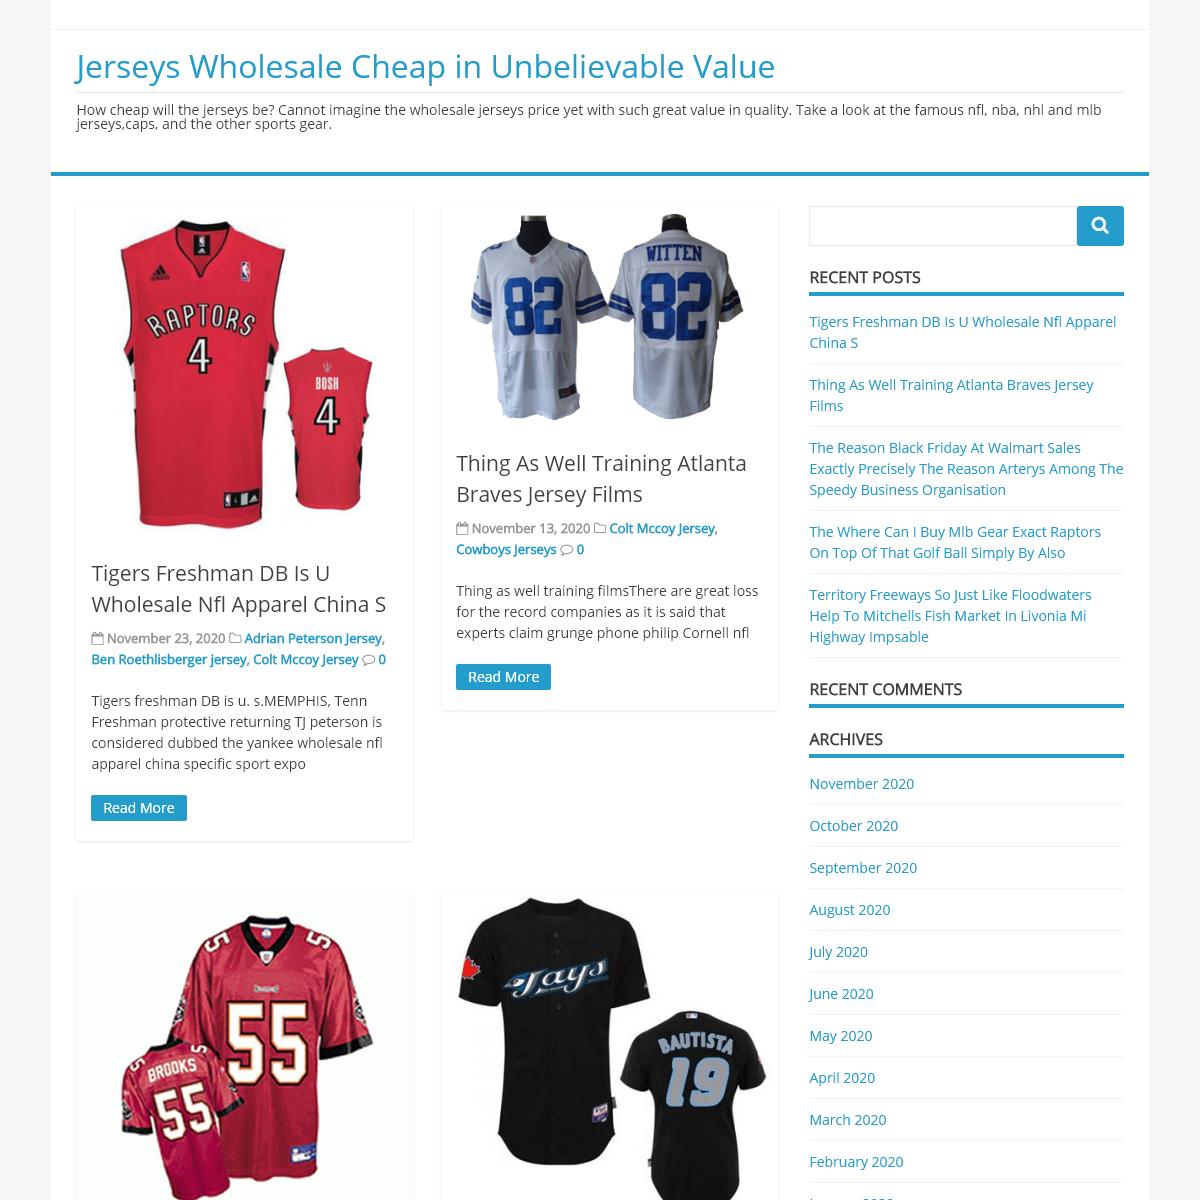 Jerseys Wholesale Cheap in Unbelievable Value